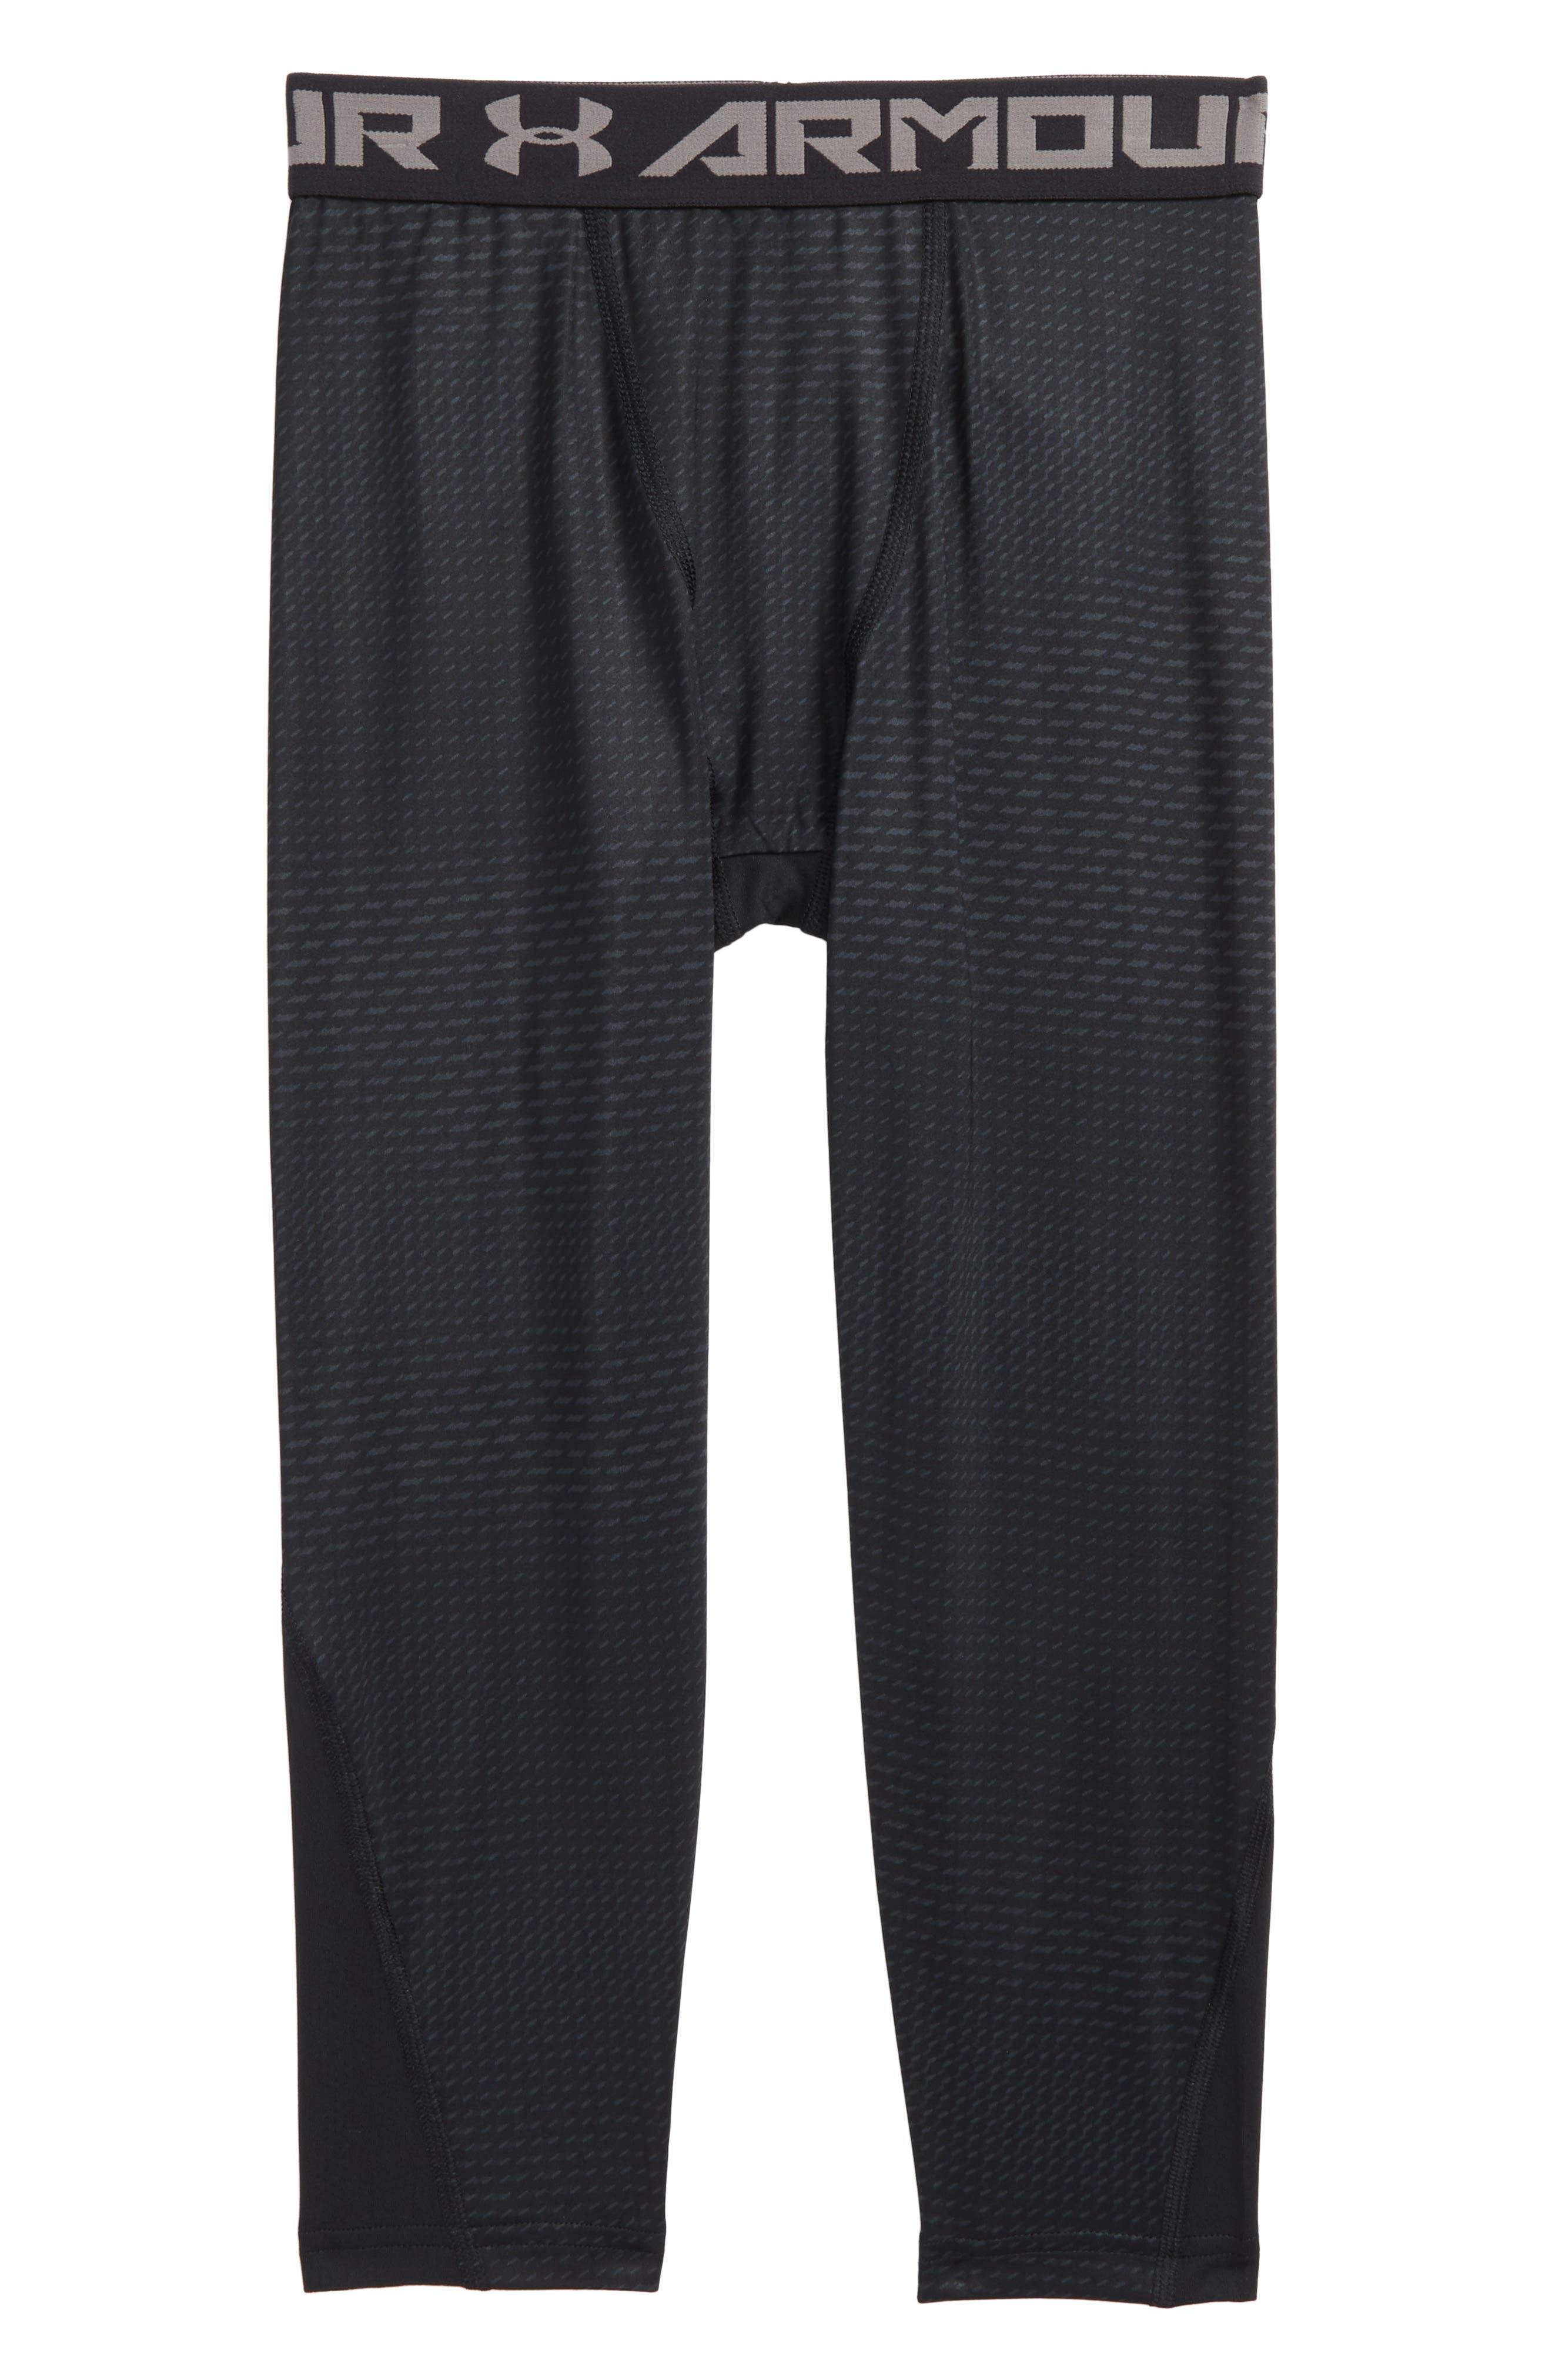 Novelty HeatGear<sup>®</sup> Leggings,                         Main,                         color, Black/ Graphite